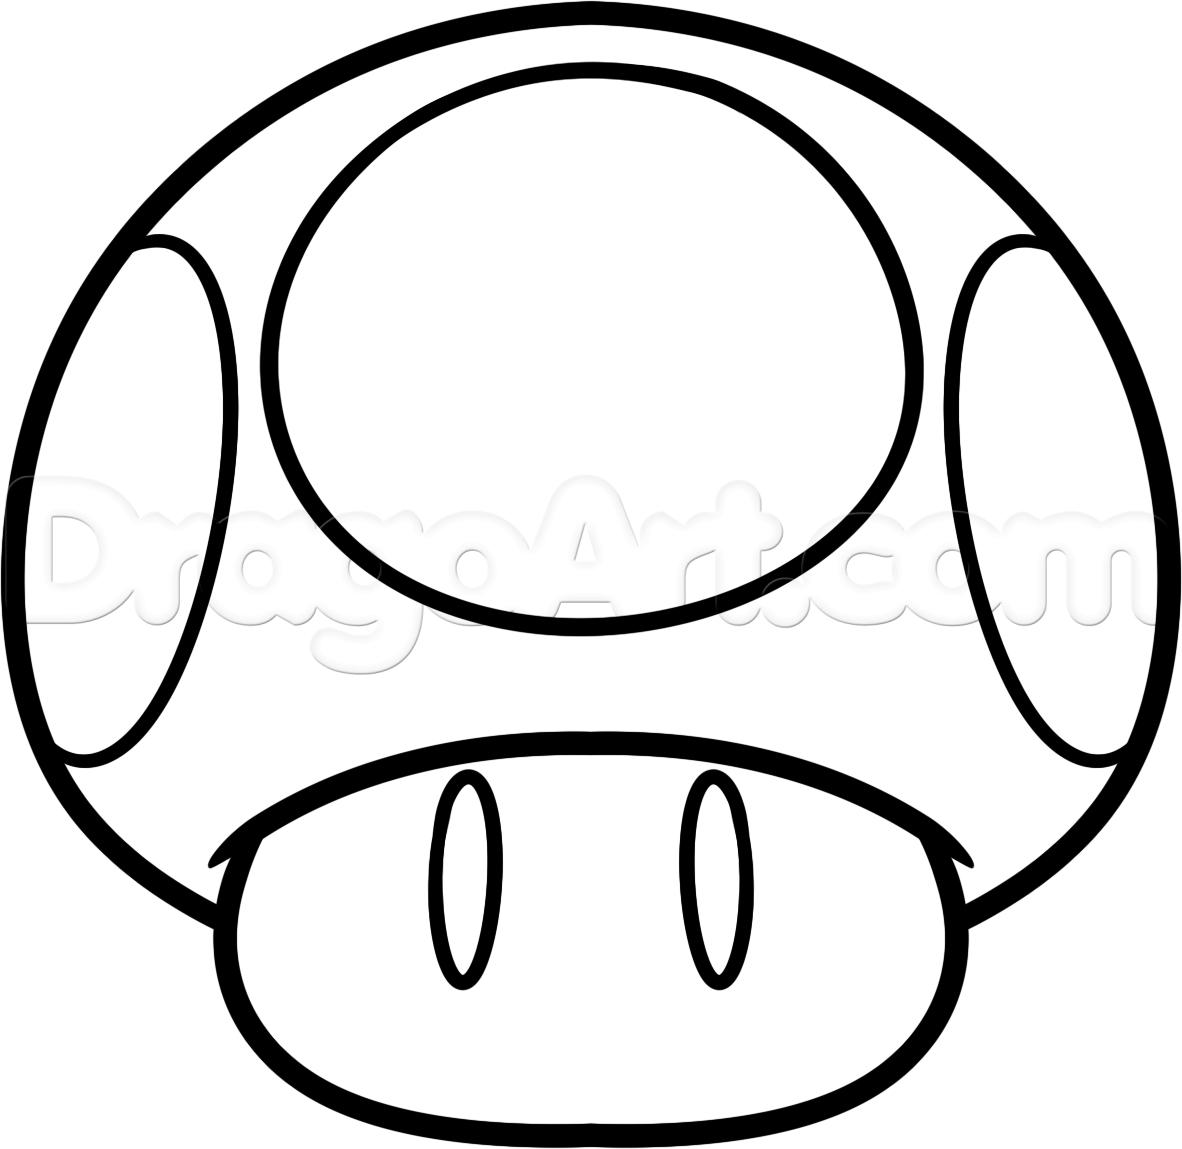 1182x1149 Graffiti Mushroom Drawings How To Draw Shrooms, Shrooms, Step By